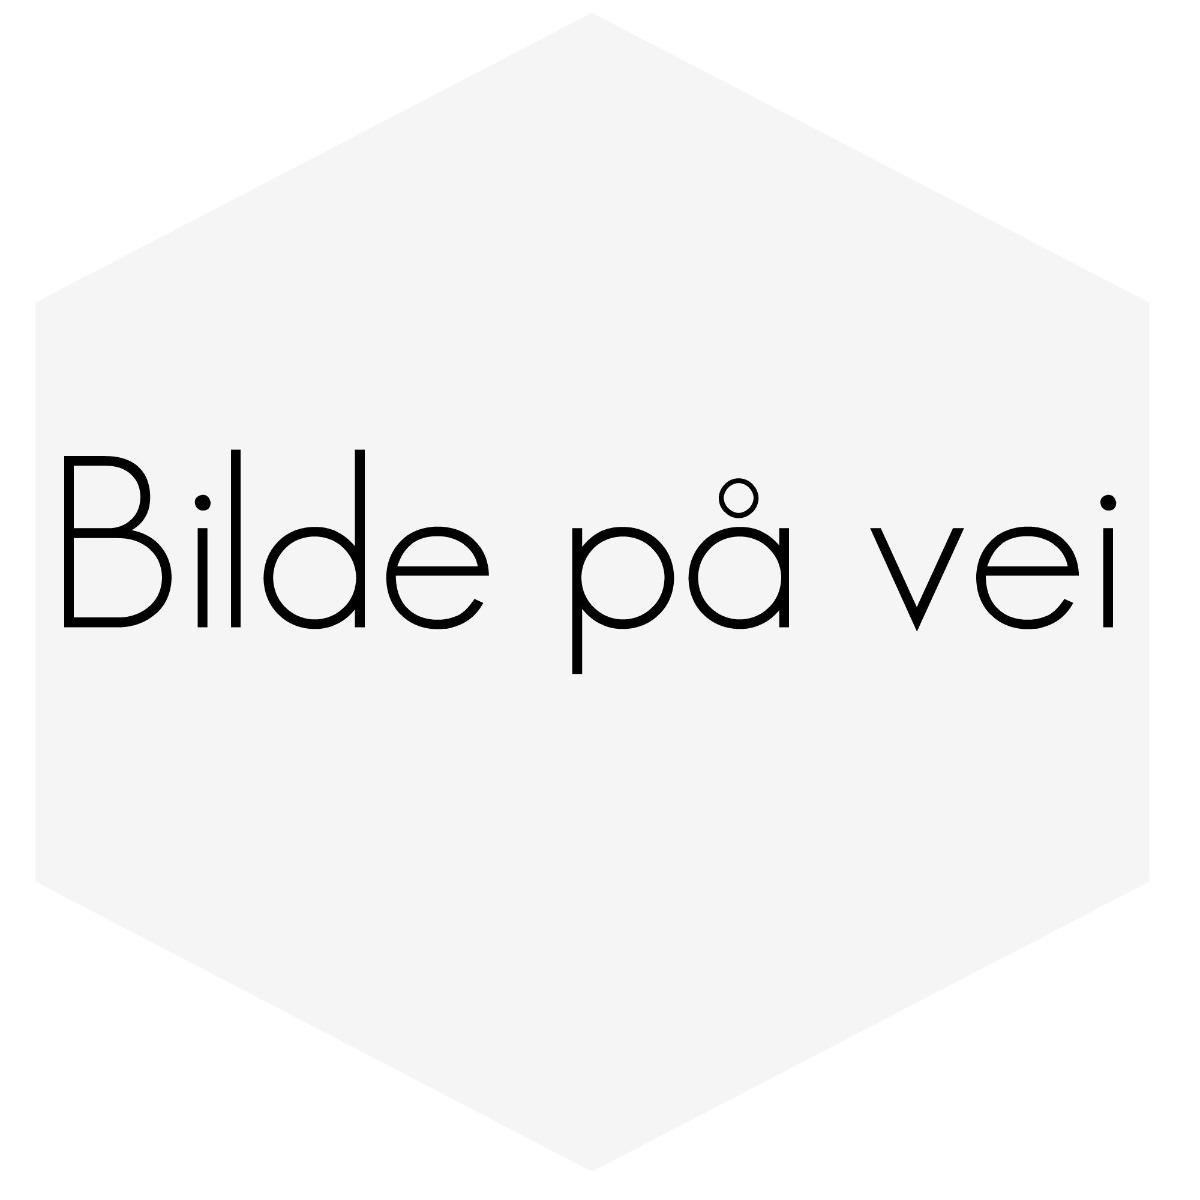 "SILIKONSLANGE RØD REDUSERING 2-2,5"" (51-63MM)"